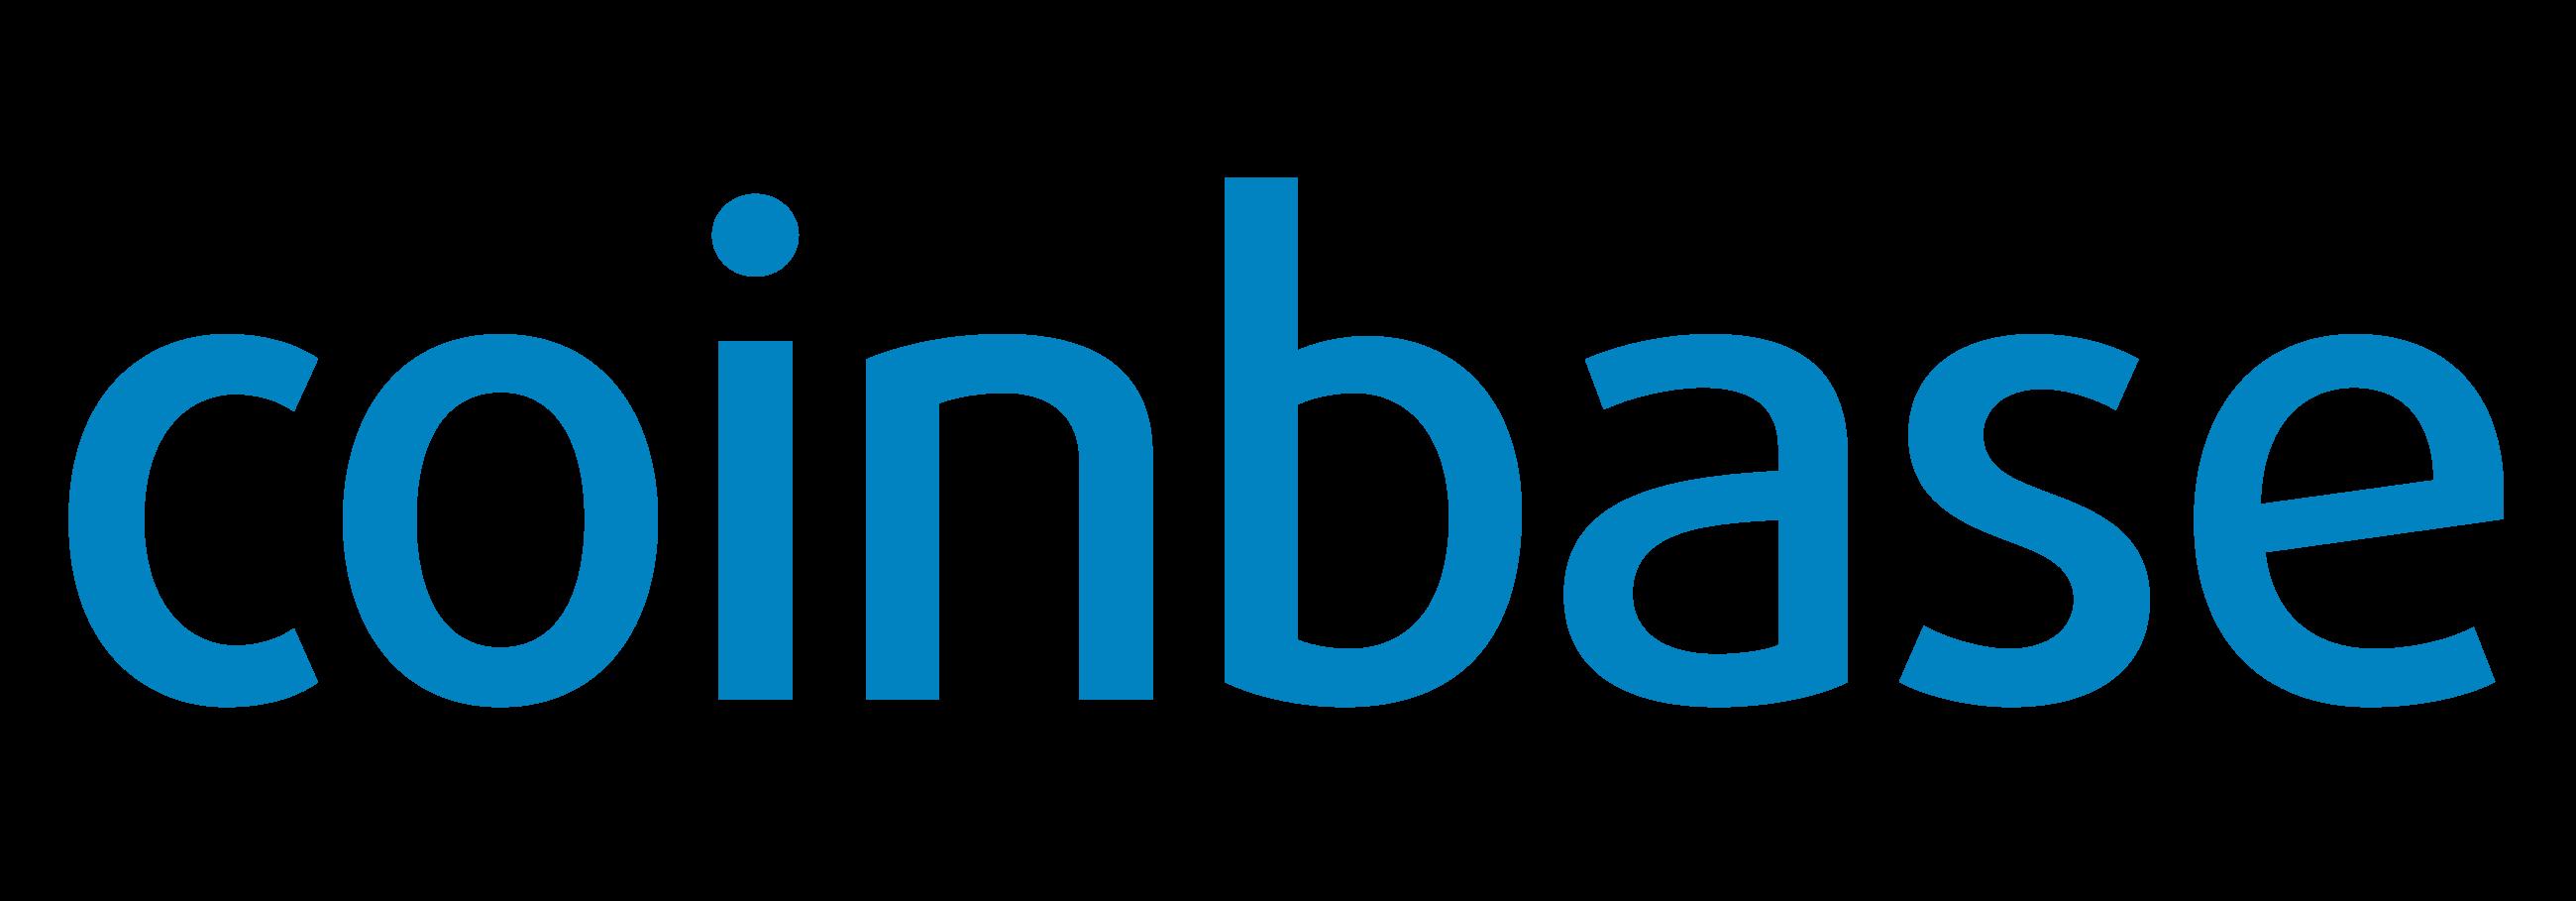 биржа Coinbase